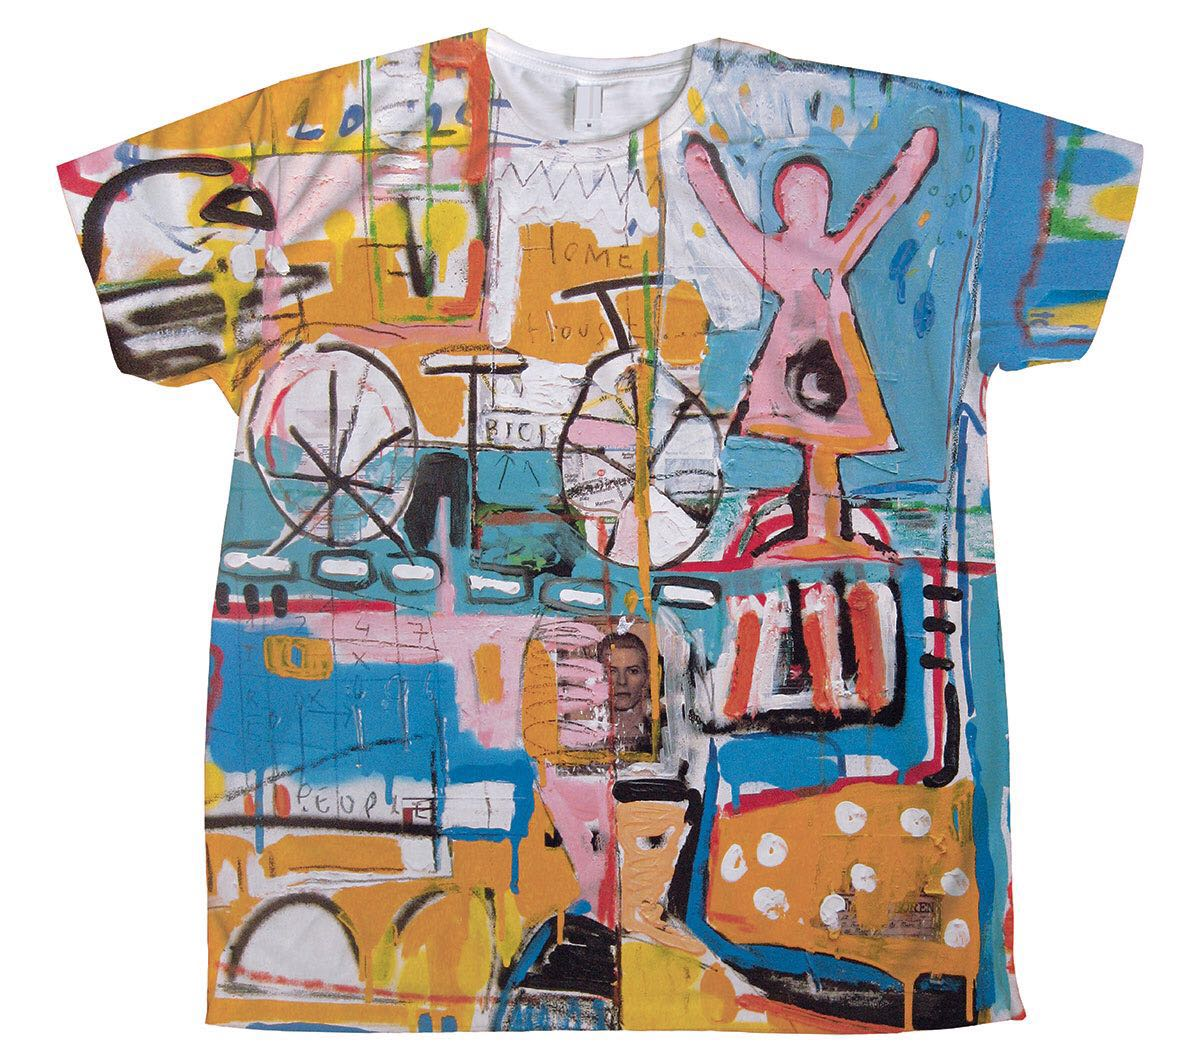 xavi garcia camiseta bowie